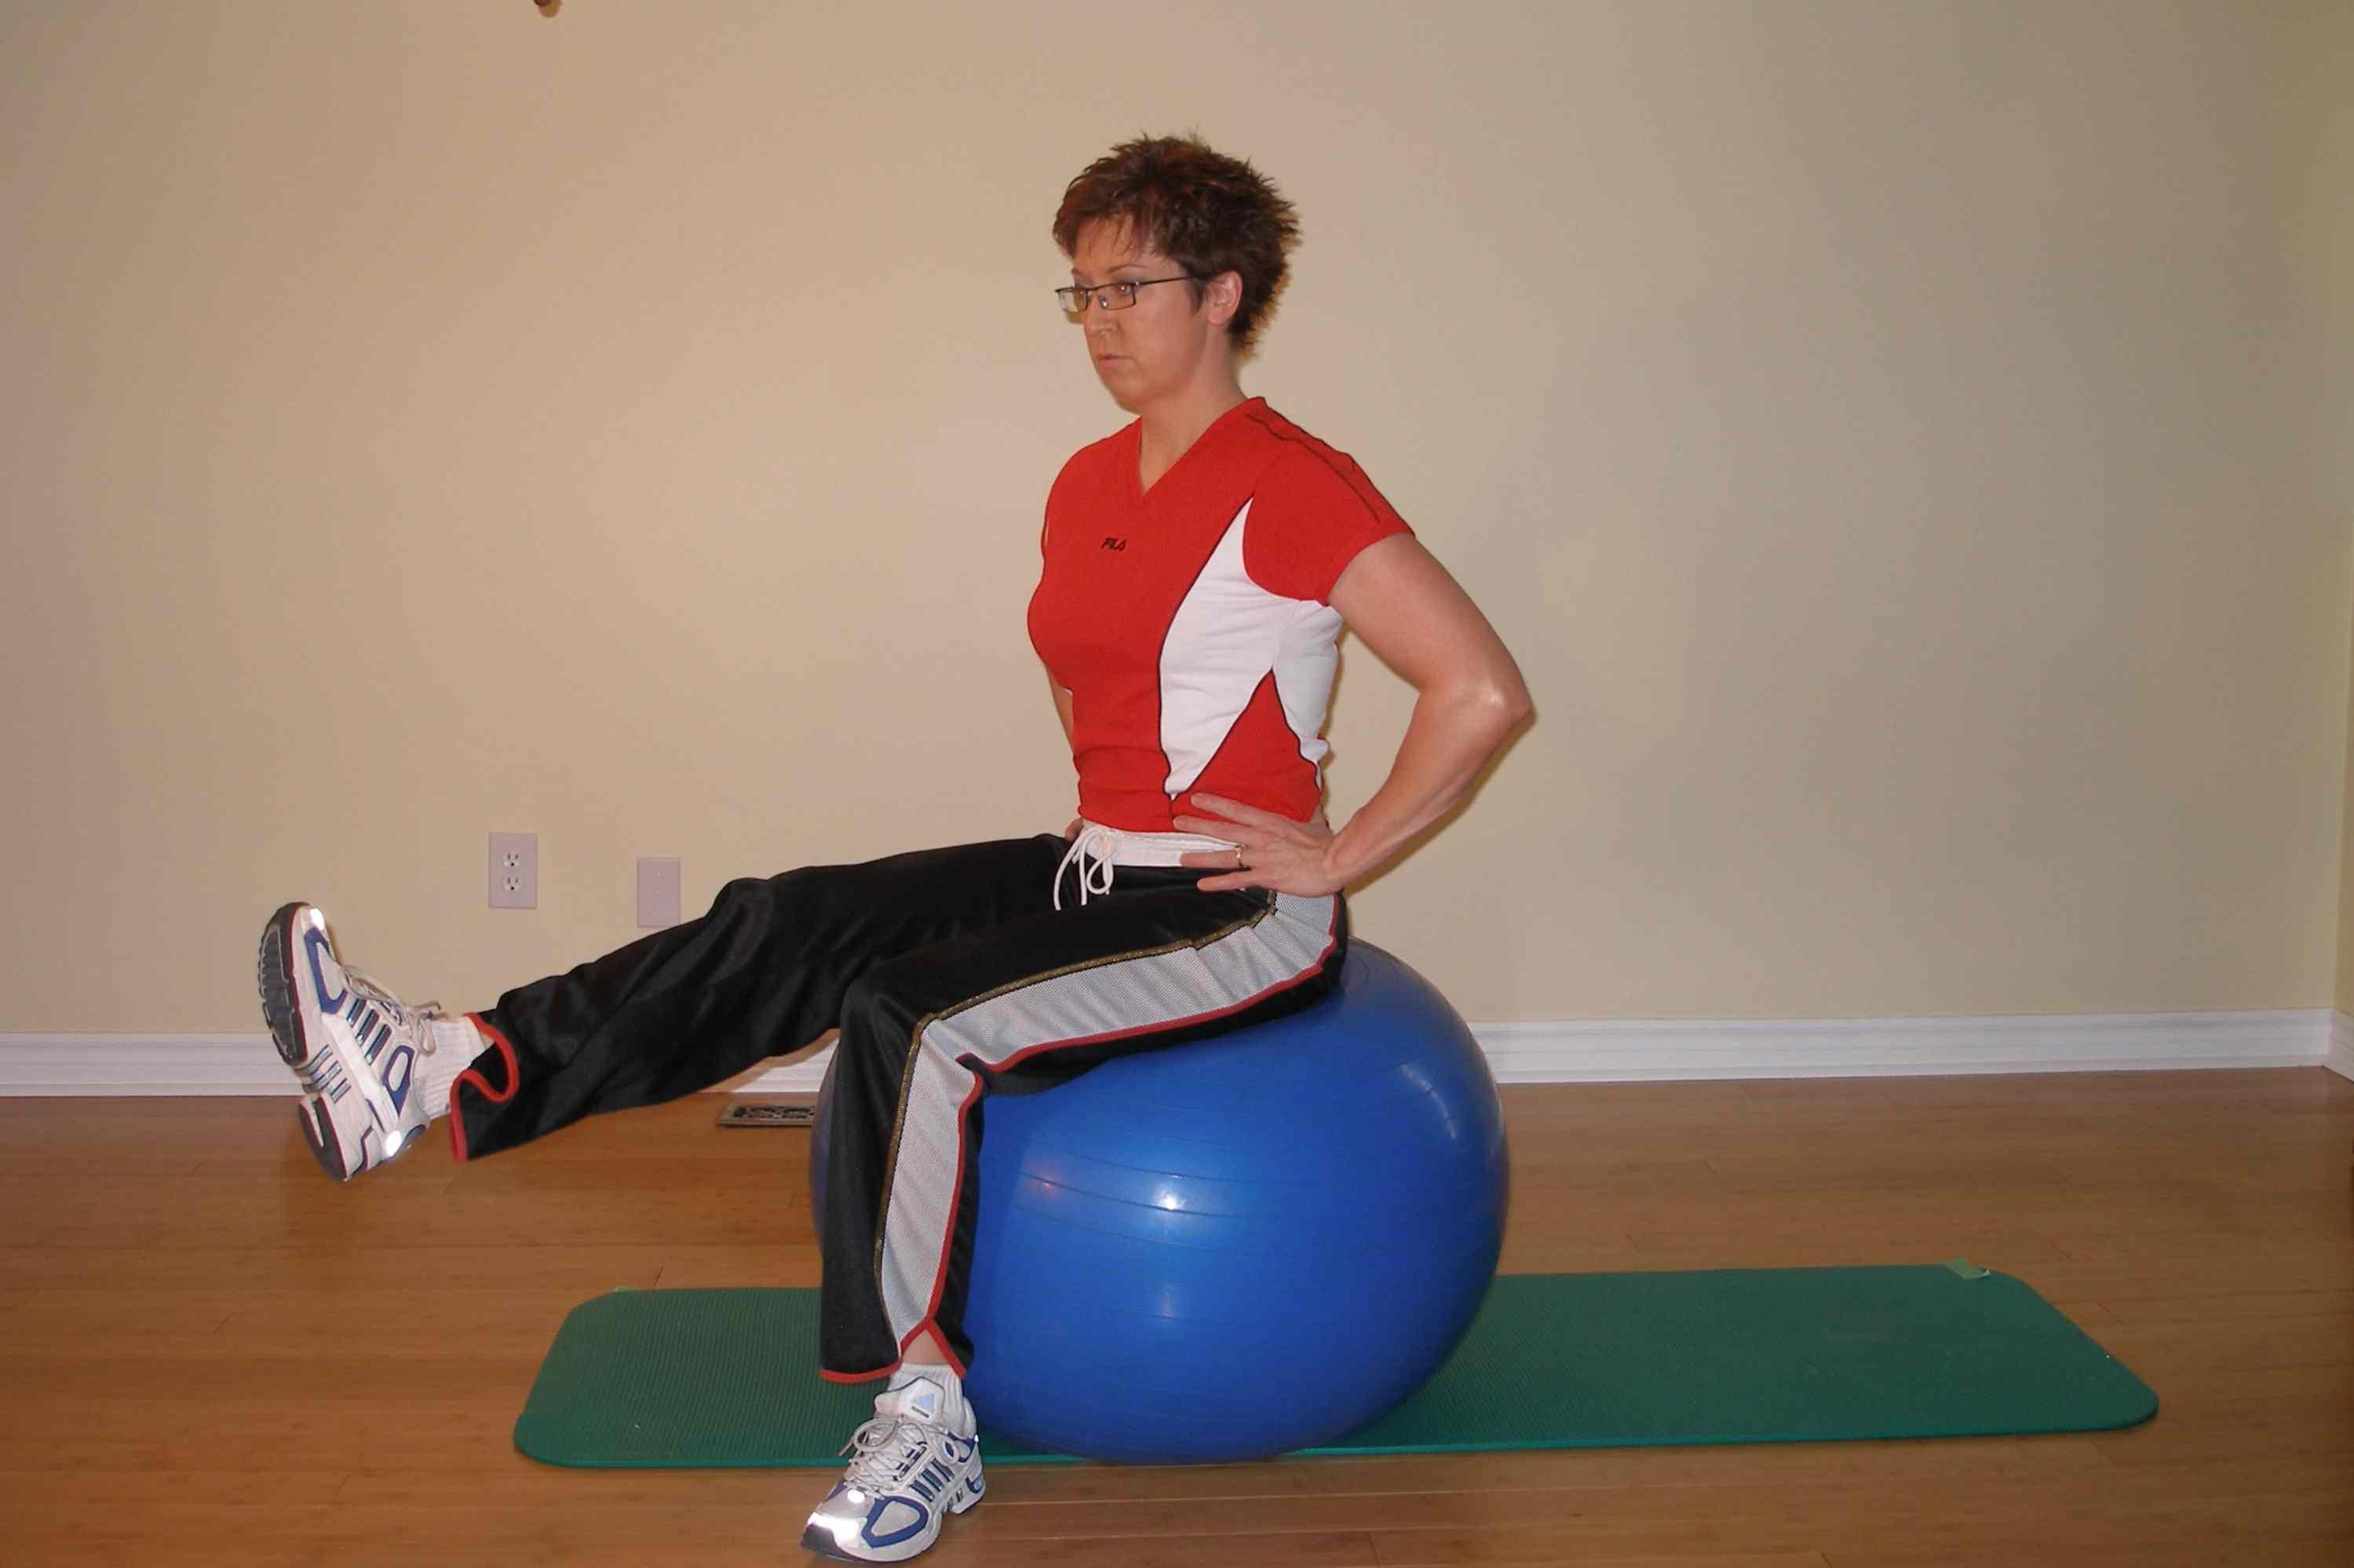 Exercise Ball Seated Leg Raise (hands on hips)